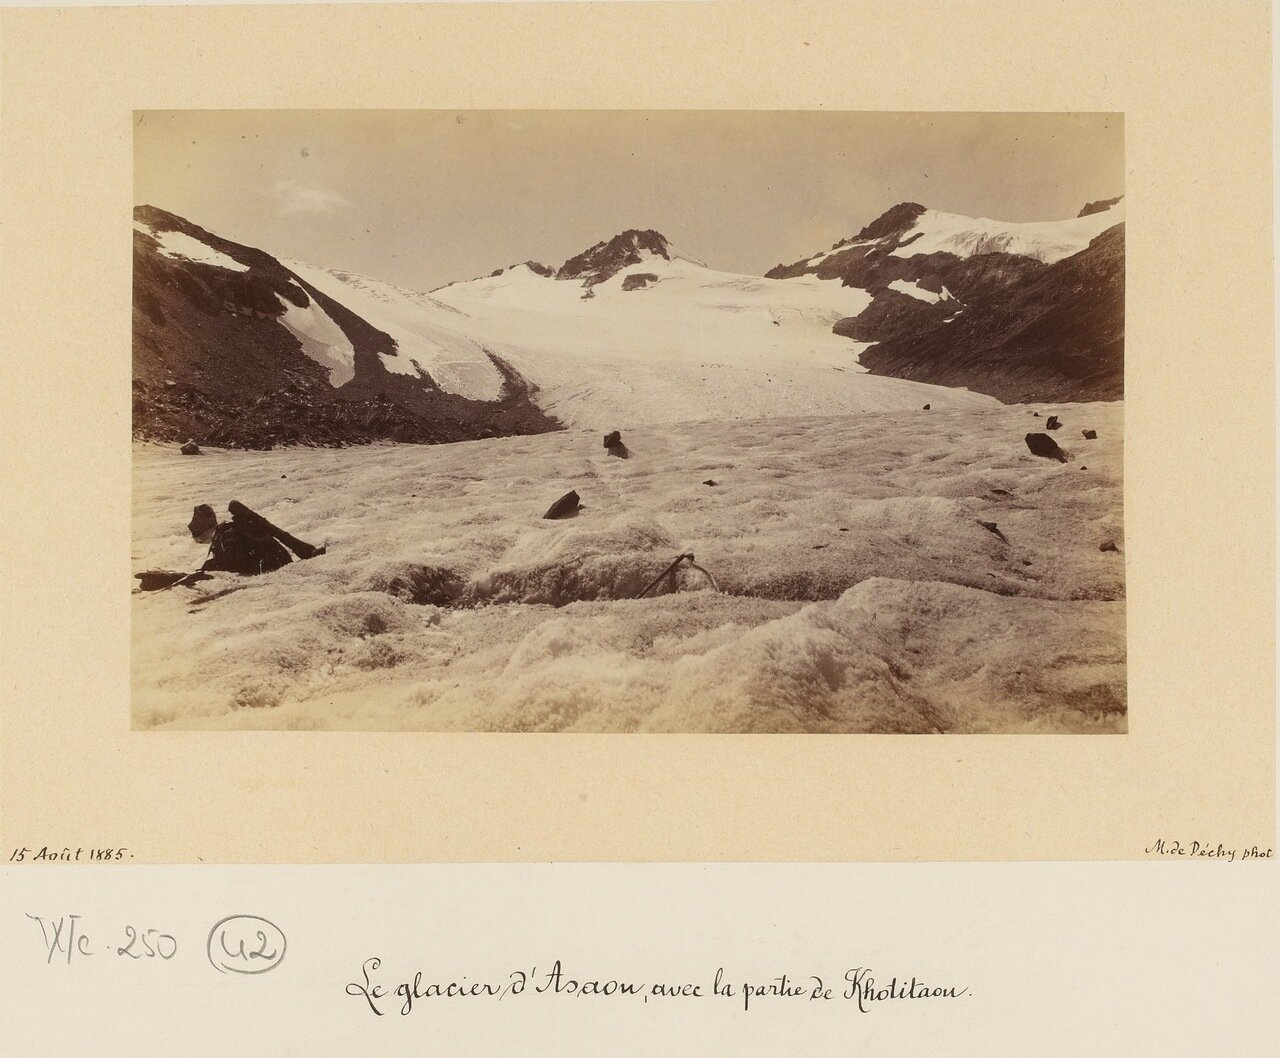 Ледник Асау с частью перевала Хотютау